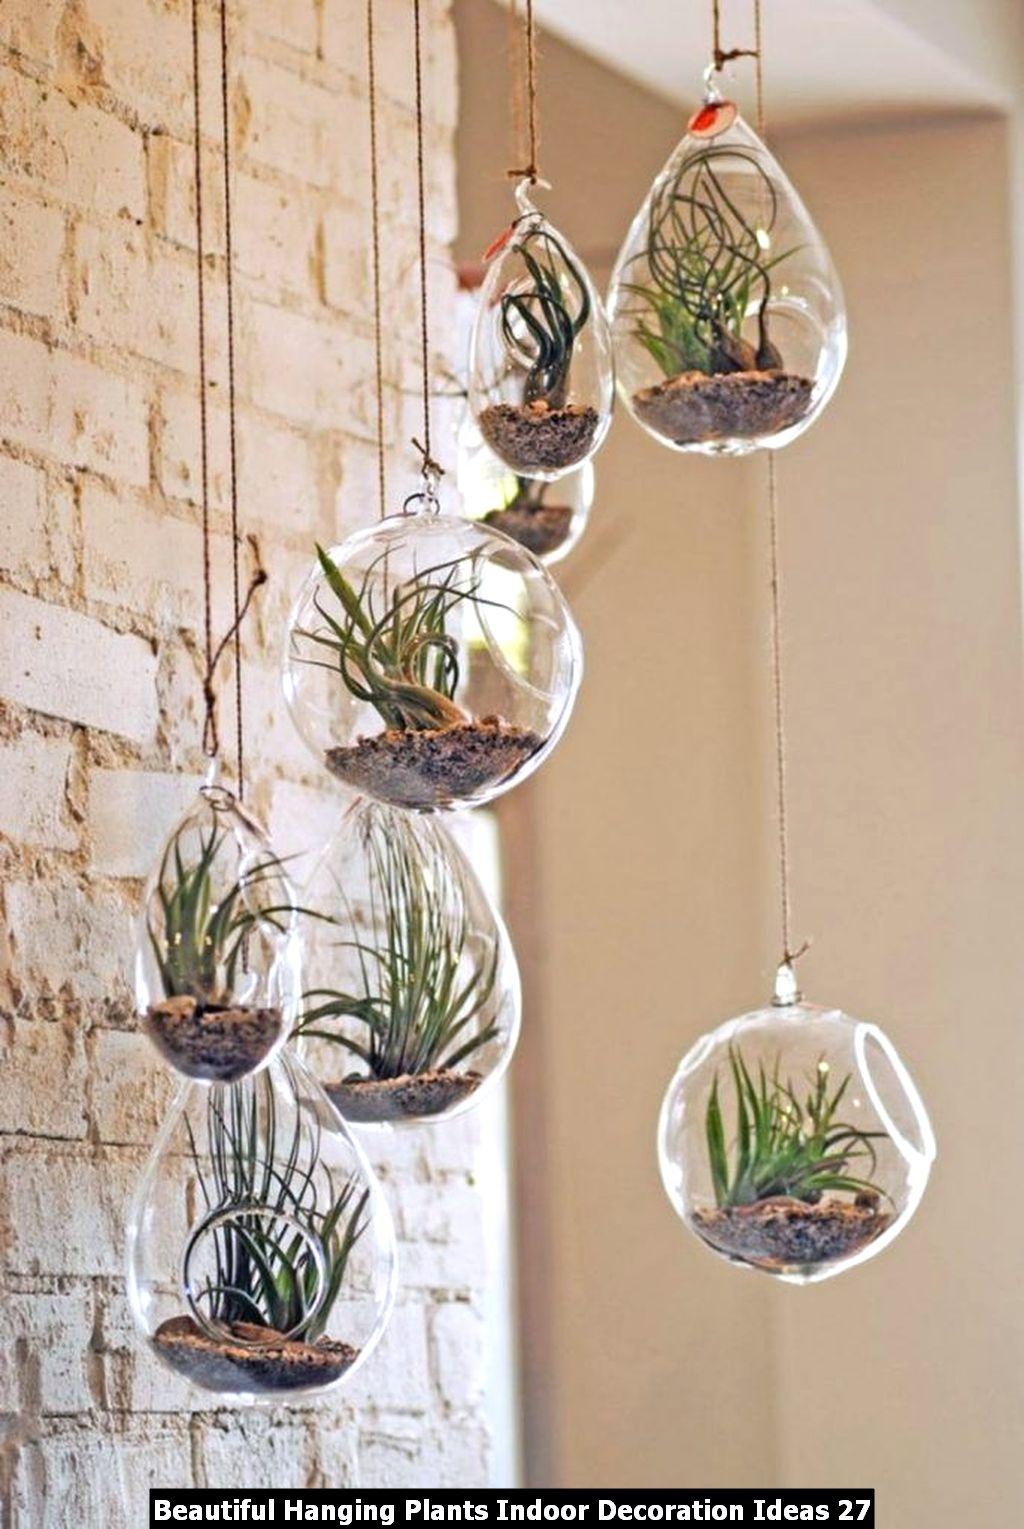 Beautiful Hanging Plants Indoor Decoration Ideas 27